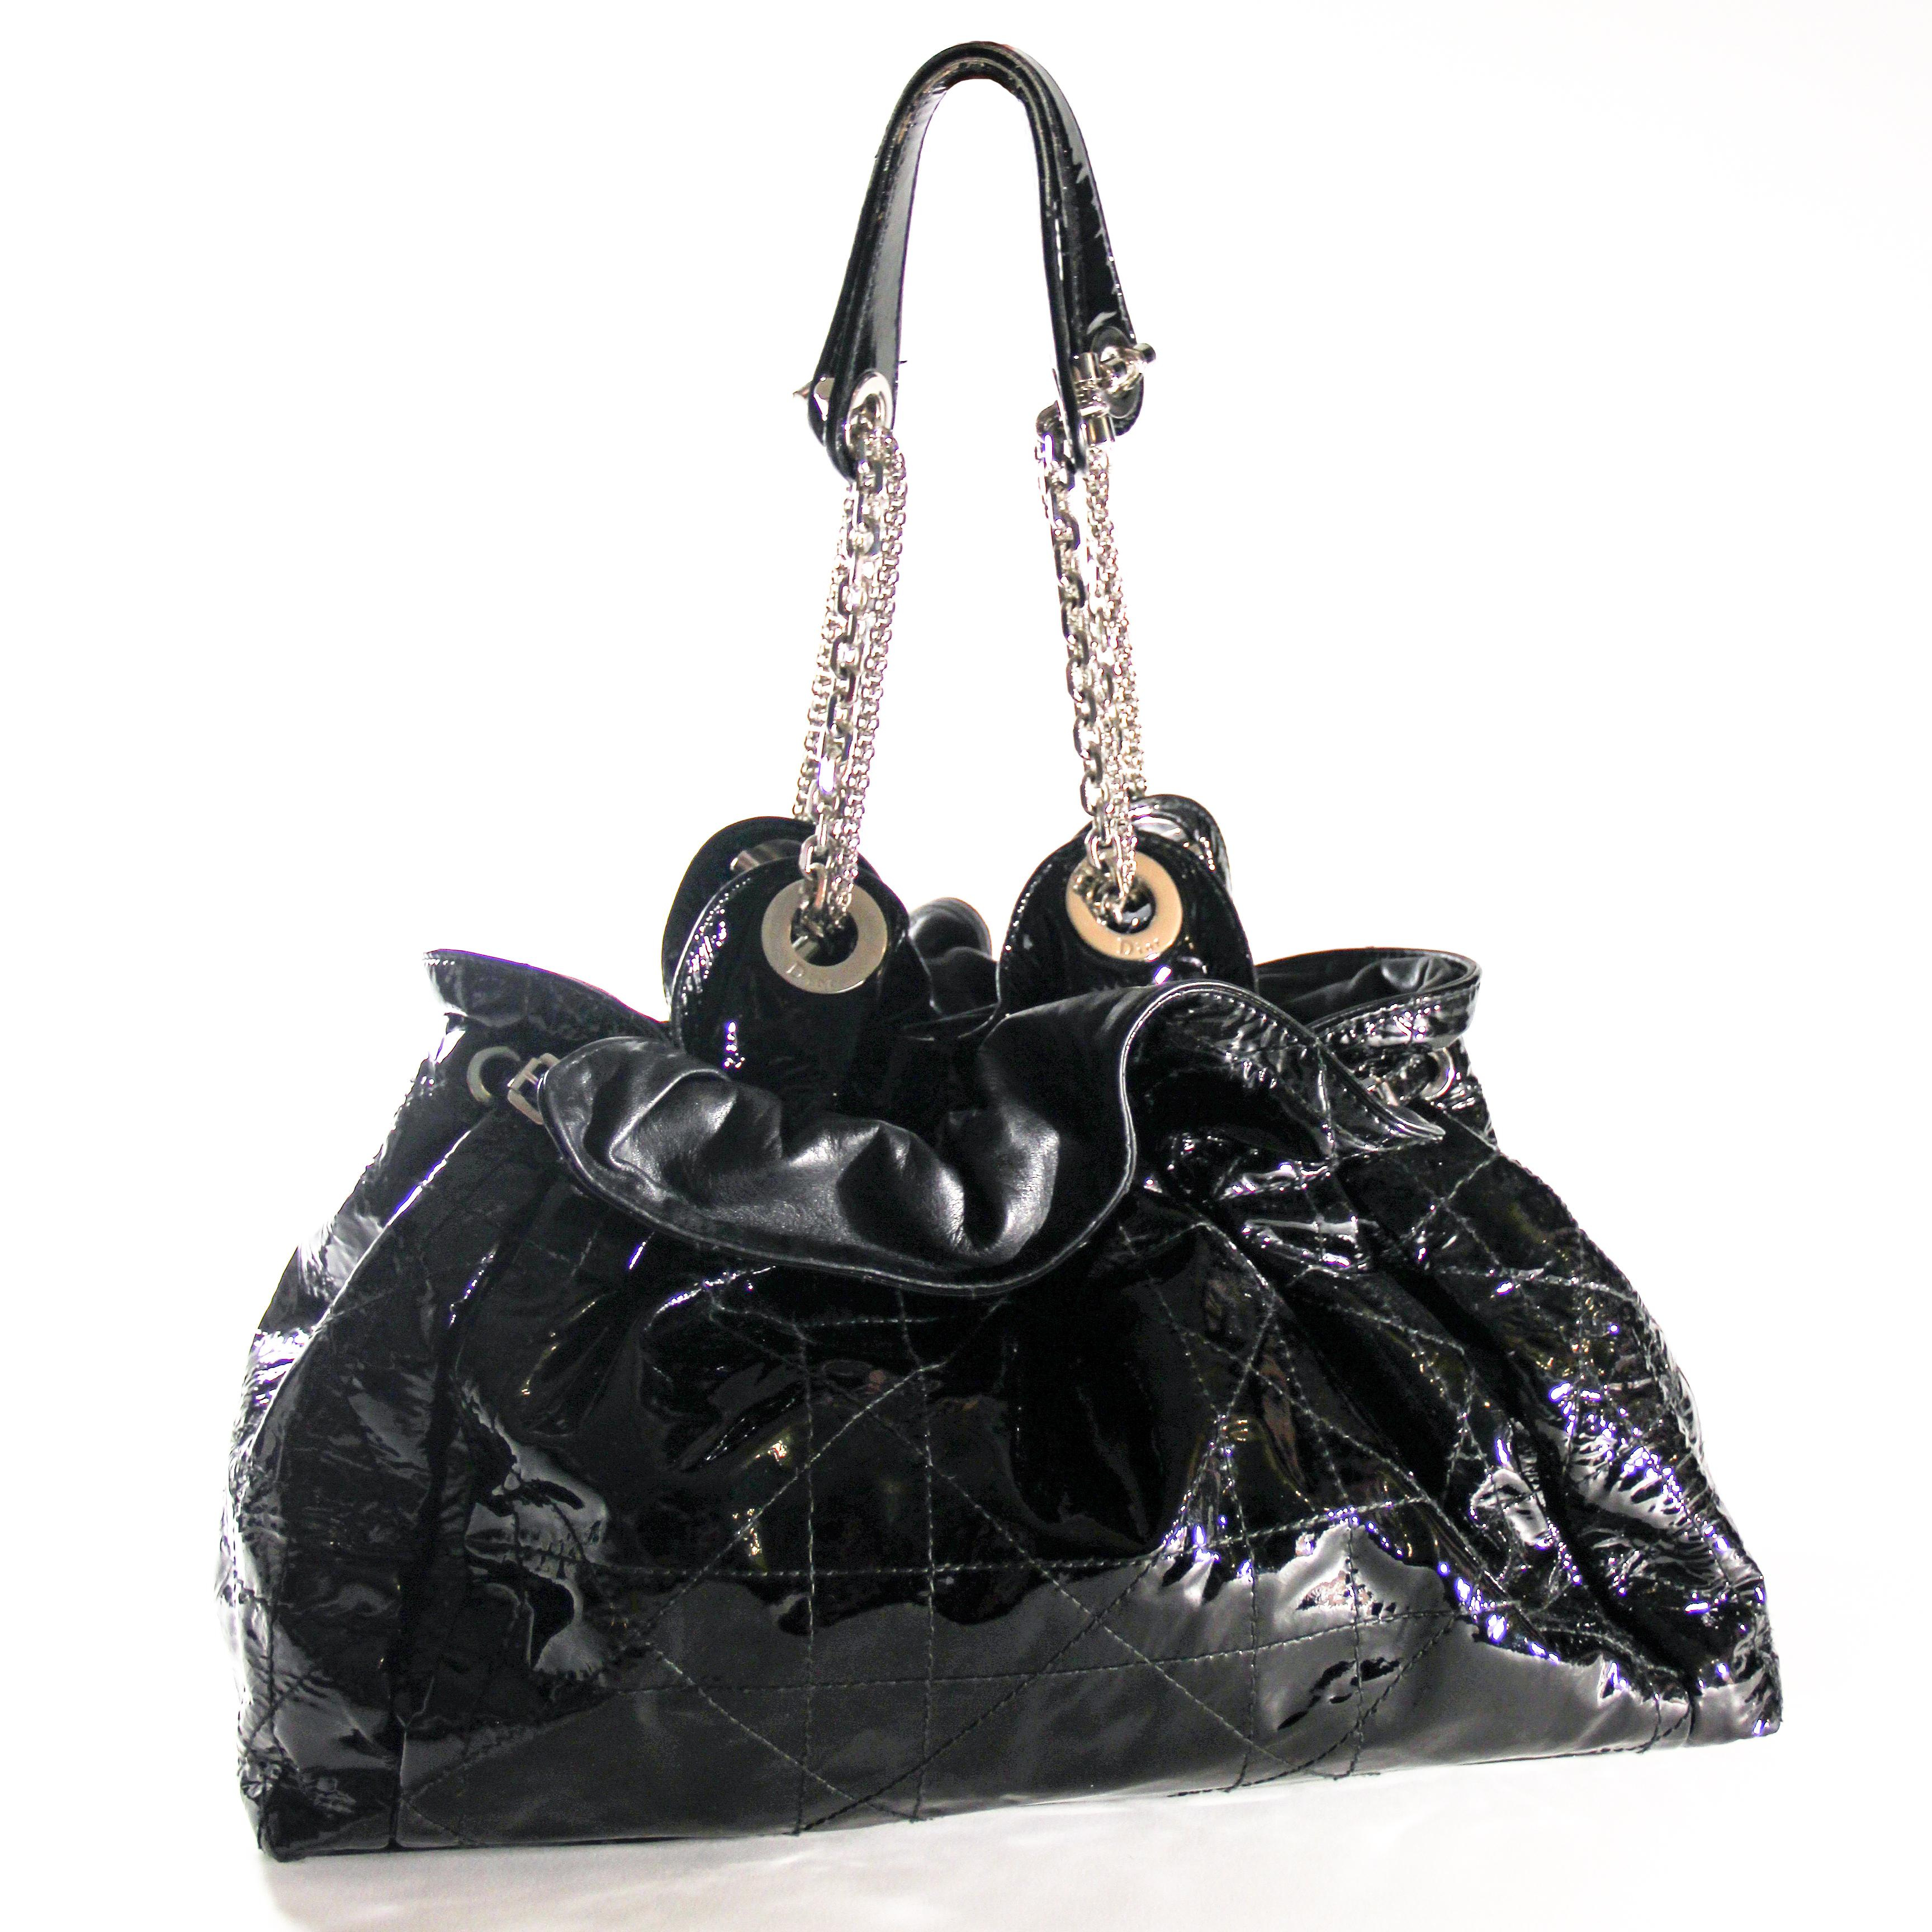 Christian Dior Bag 1.jpg